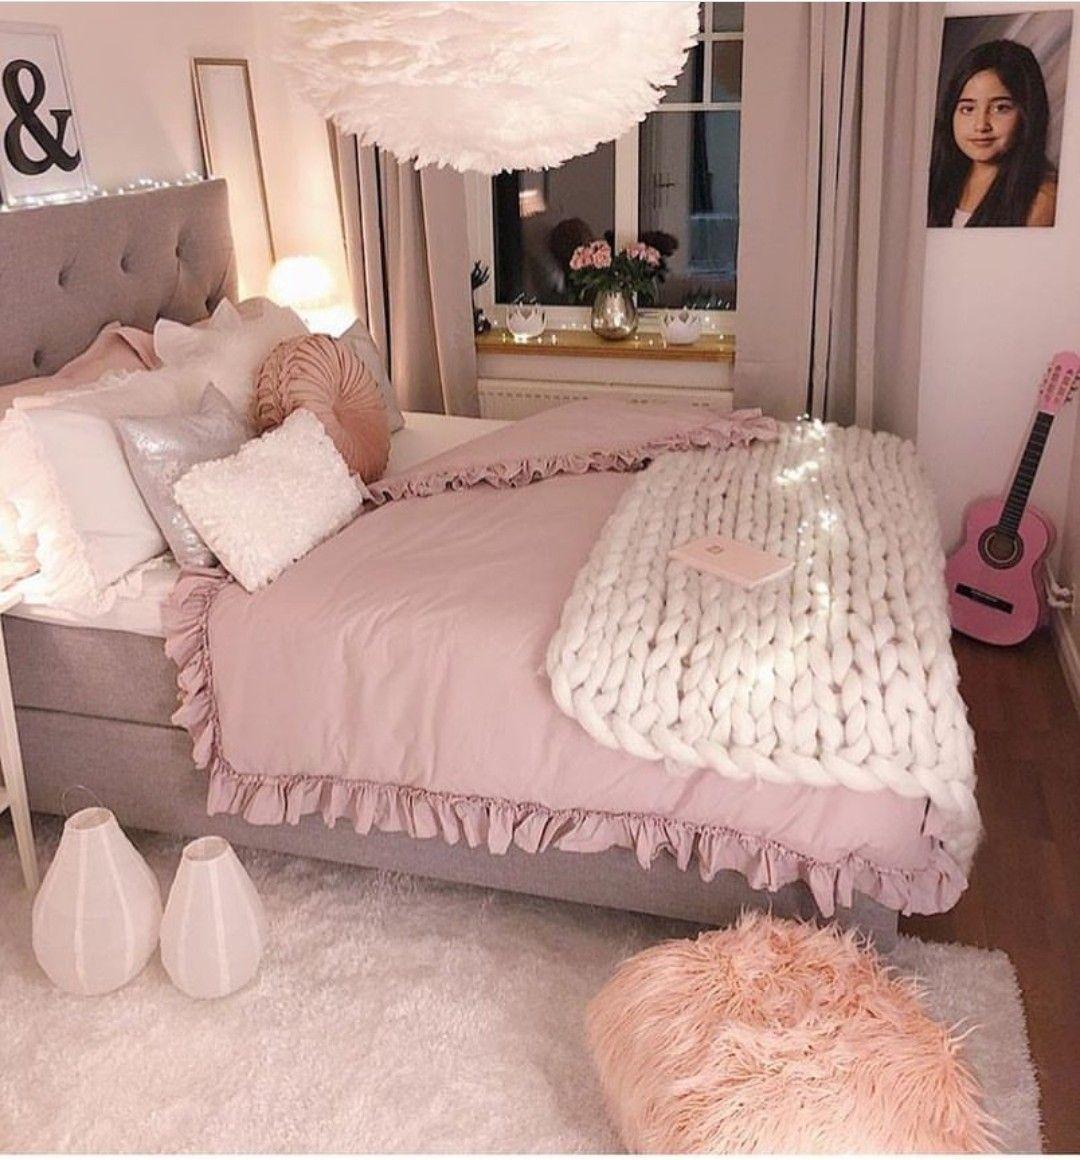 Home Decor Cozy Room Room Inspiration Bedroom Bedroom Decor